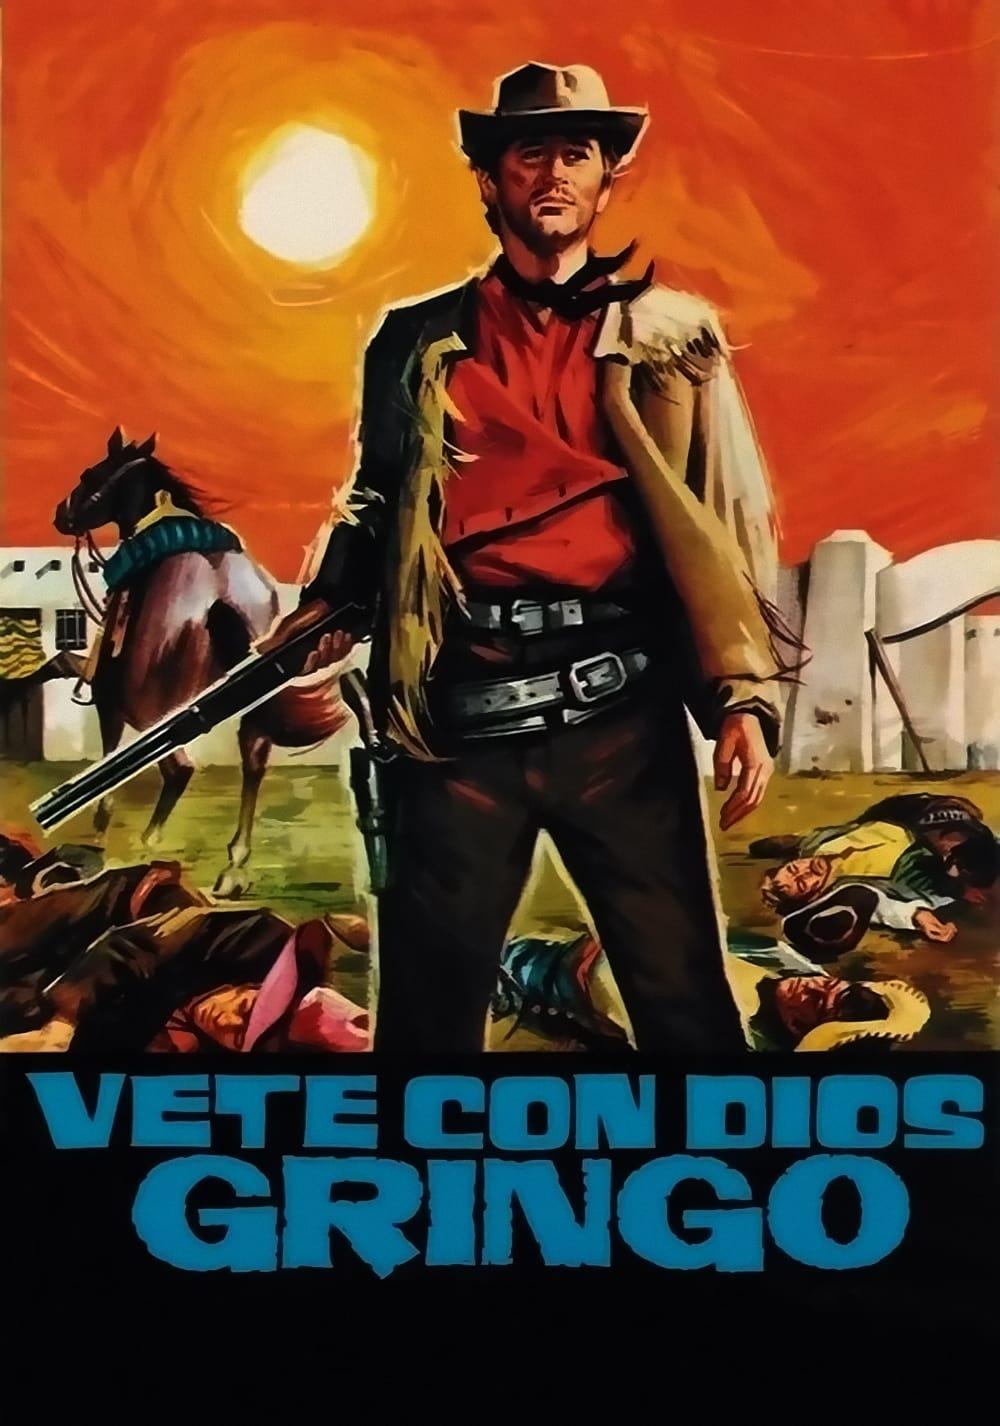 Go with God, Gringo